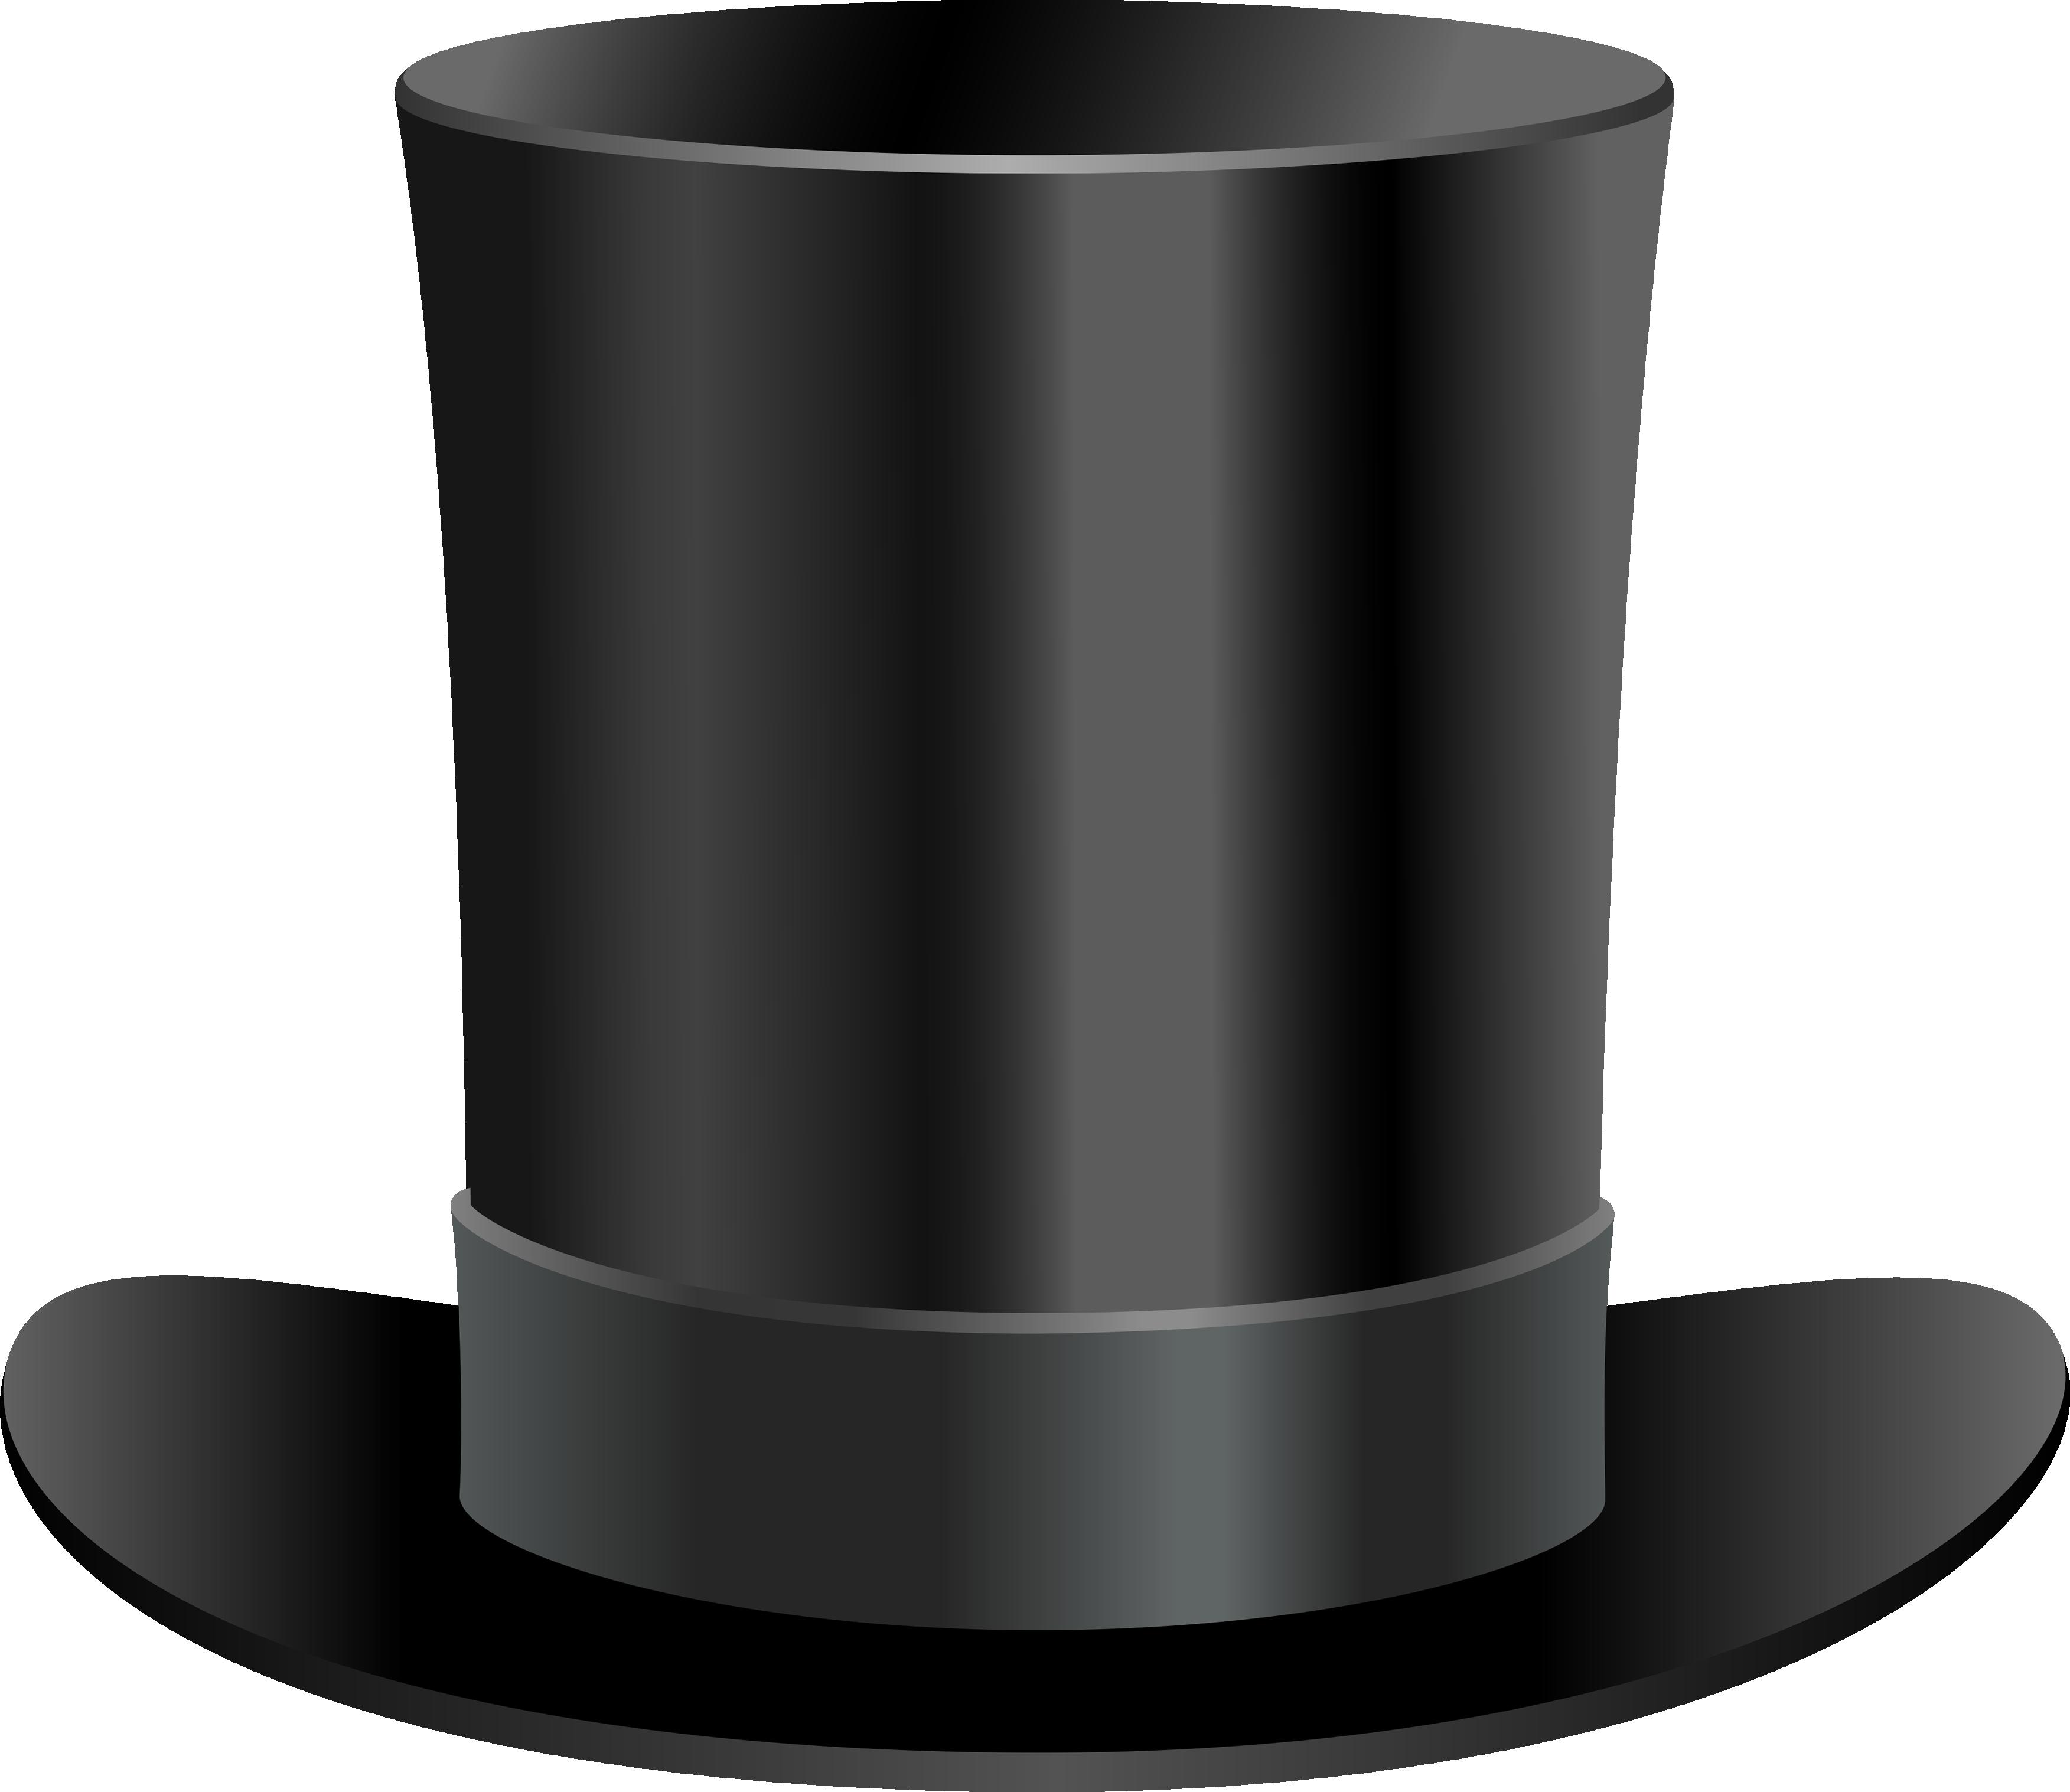 Black Top Hat PNG Image.